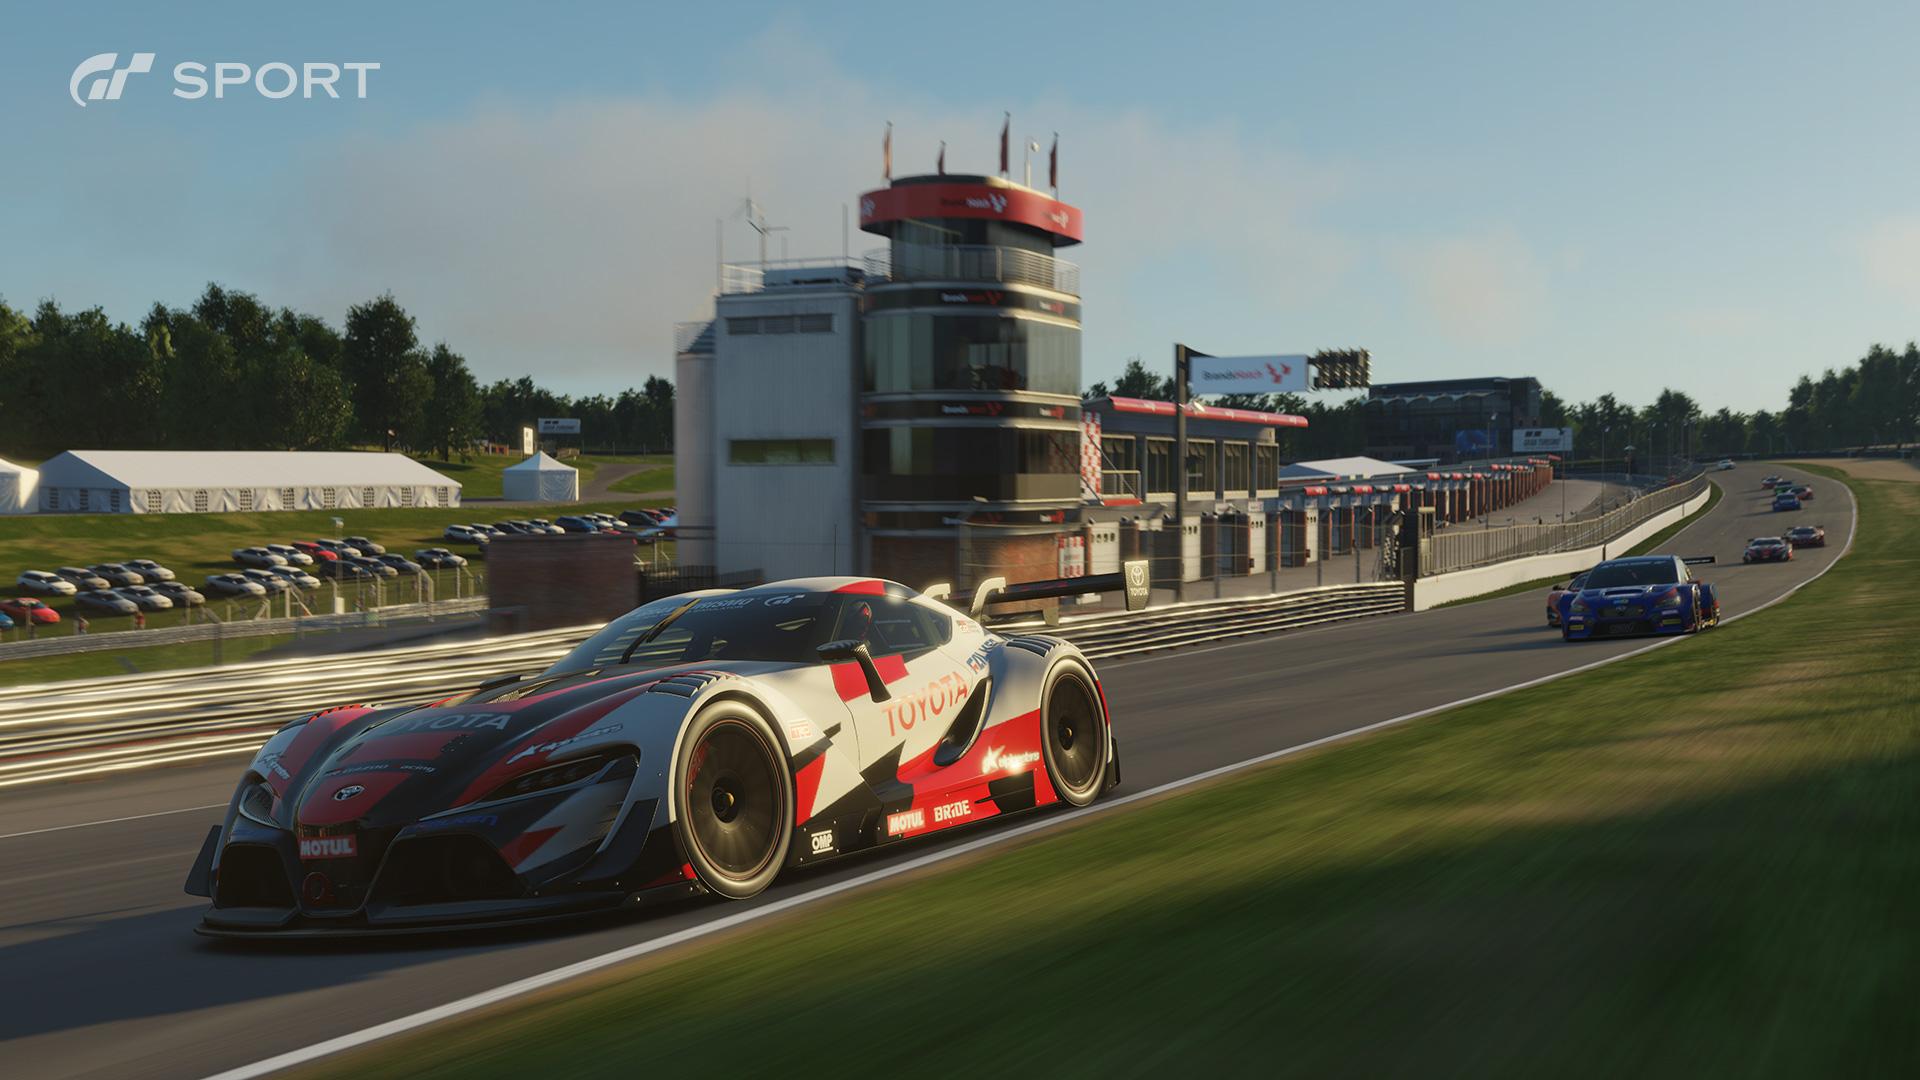 Gran Turismo Sport's engine sounds show significant improvement